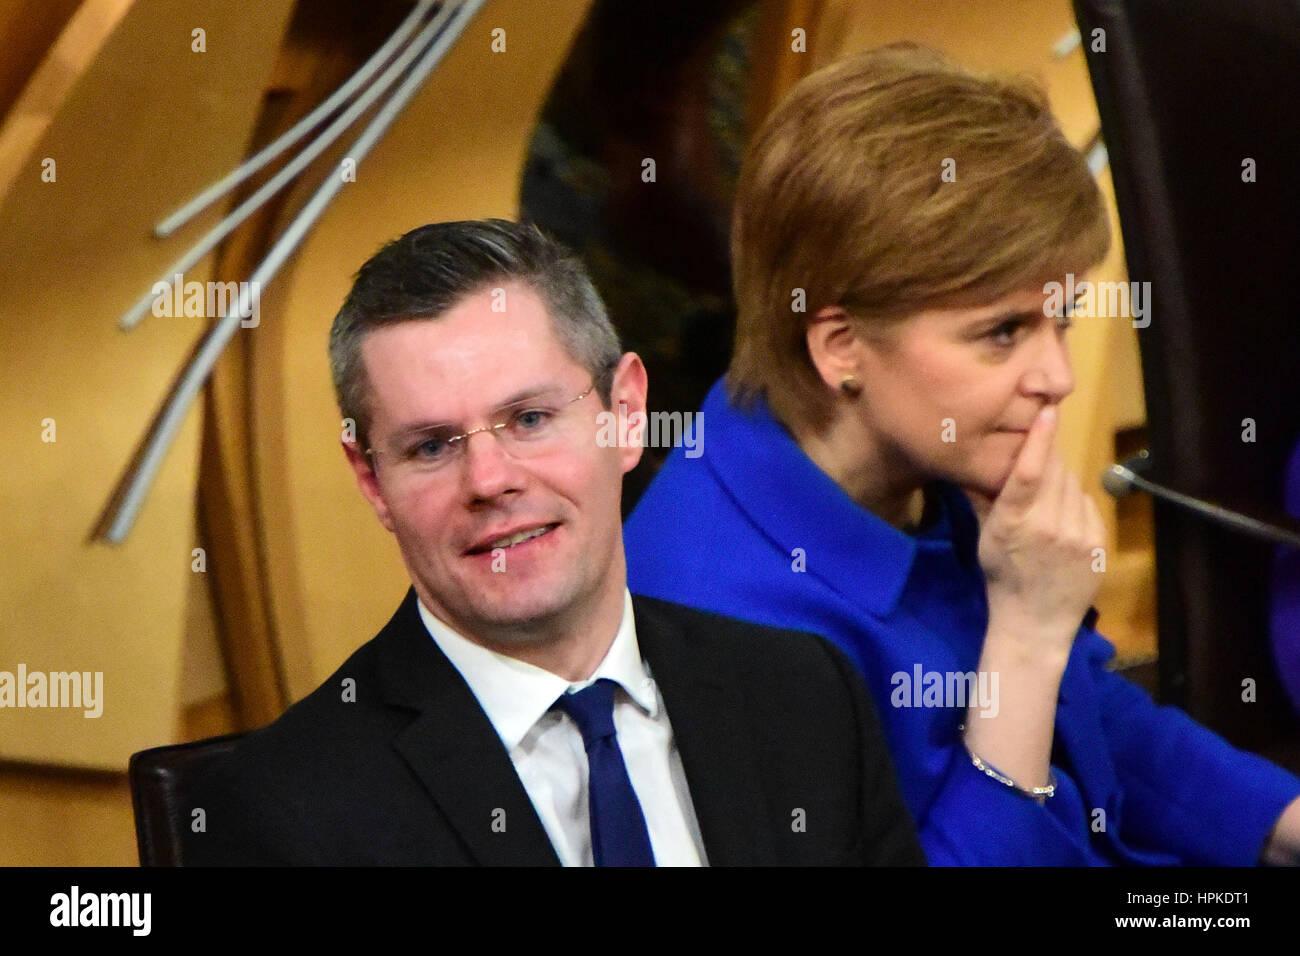 Edinburgh, Scotland, United Kingdom. 23rd February, 2017. Scottish Finance Secretary Derek Mackay and First Minister - Stock Image